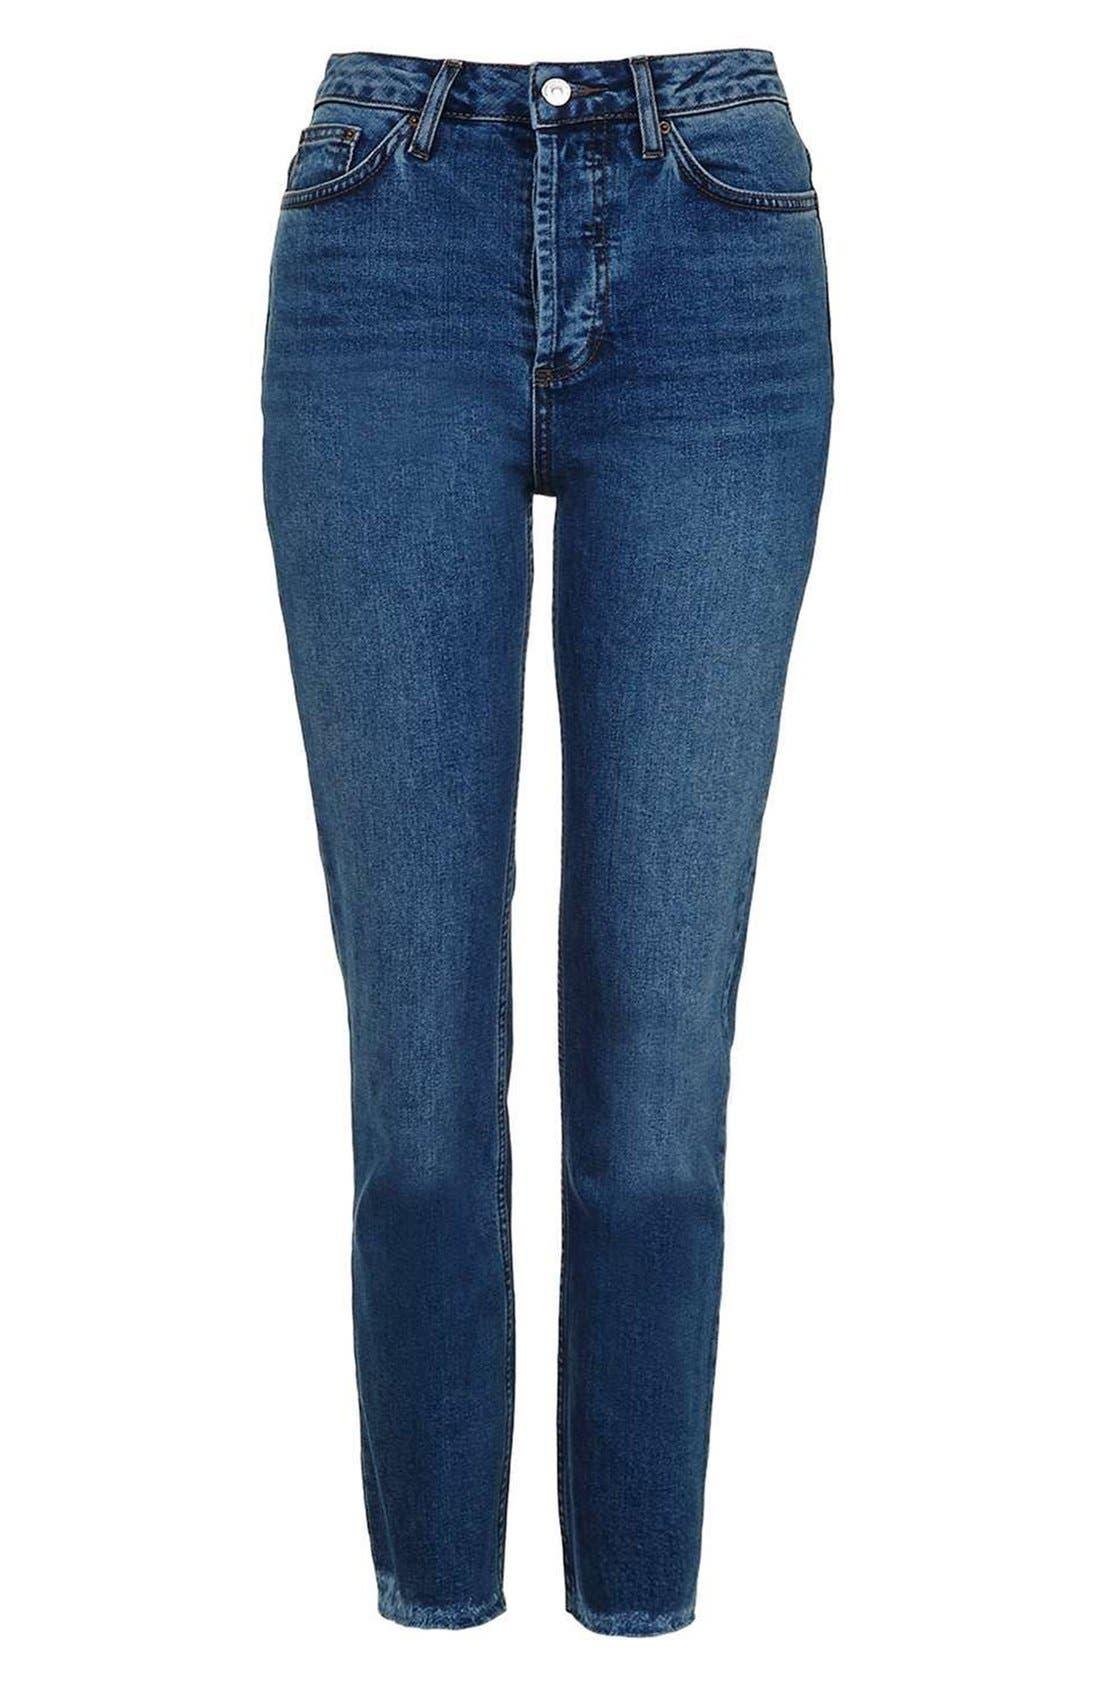 TOPSHOP, Raw Hem Straight Leg Jeans, Alternate thumbnail 4, color, 401